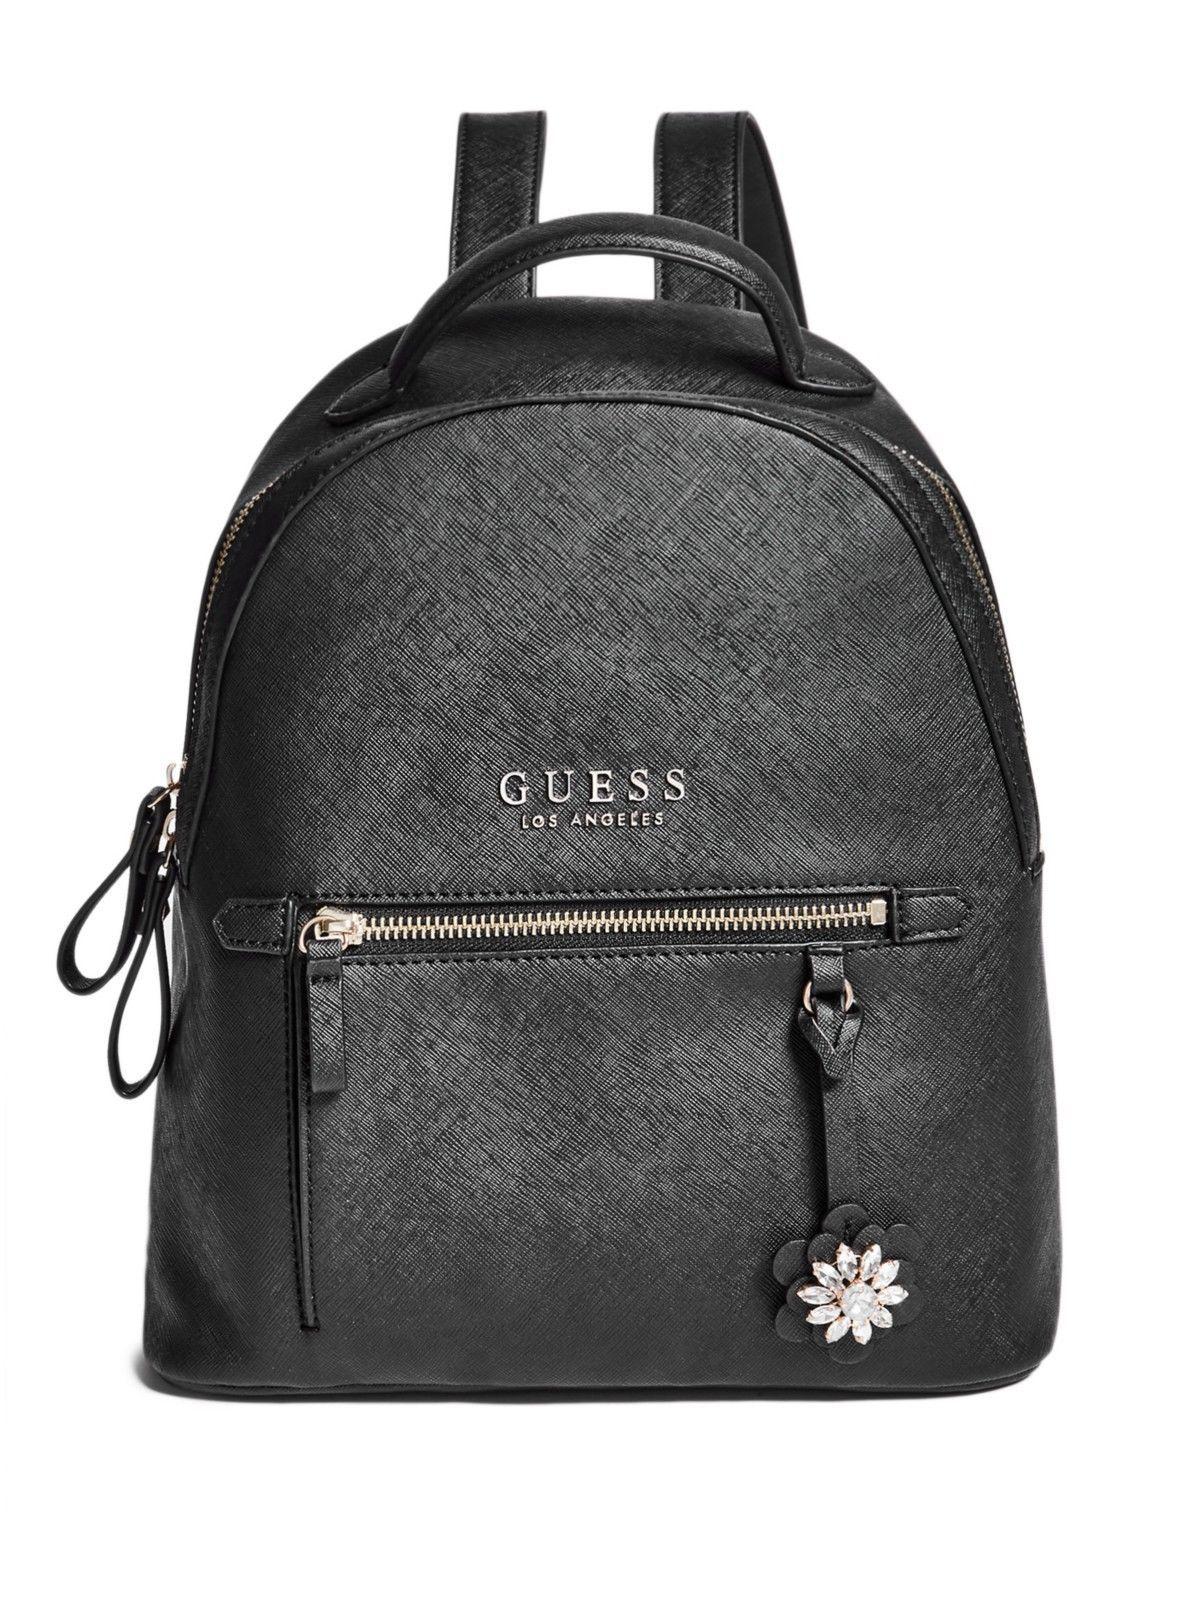 GUESS Factory Women s Monty Logo Backpack  41.99  guess  handbag ... ca09bf41cad31